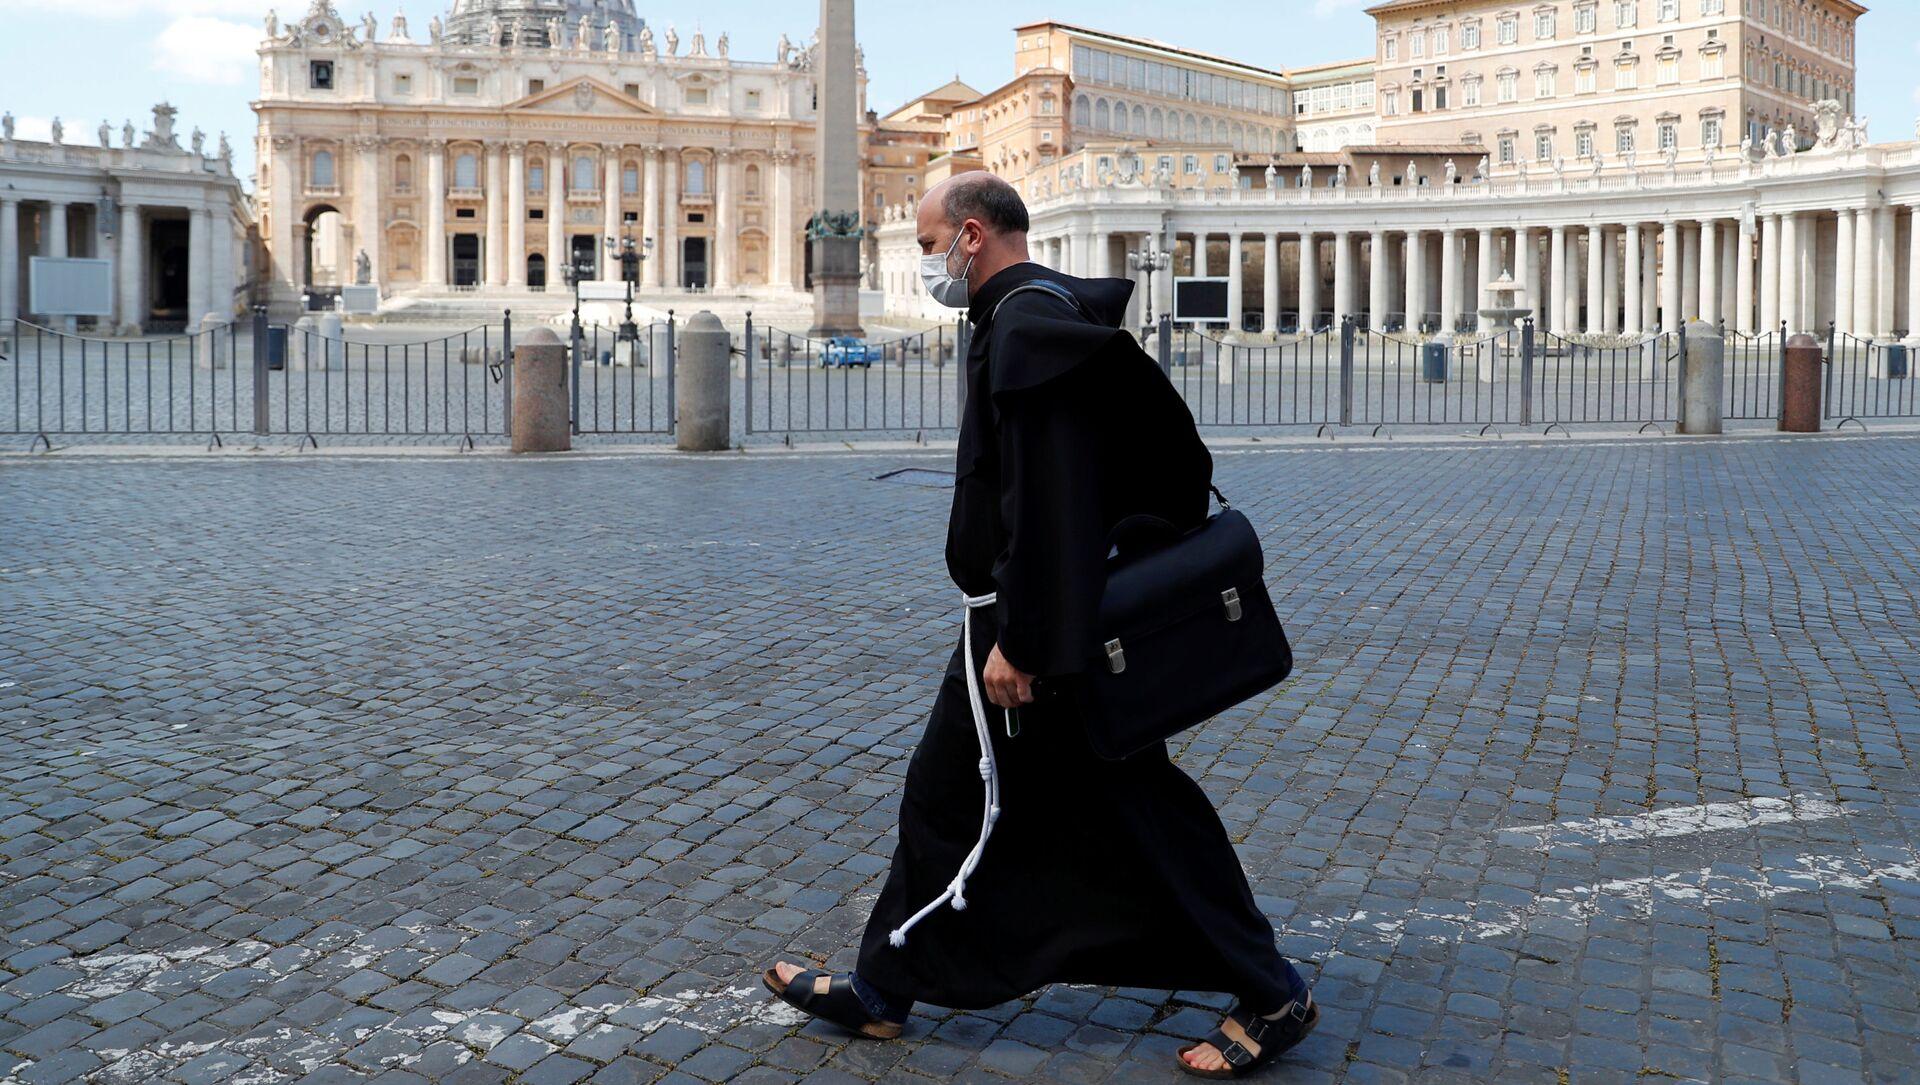 Монах на опустевшей площади Святого Петра, Ватикан - Sputnik Абхазия, 1920, 13.09.2021